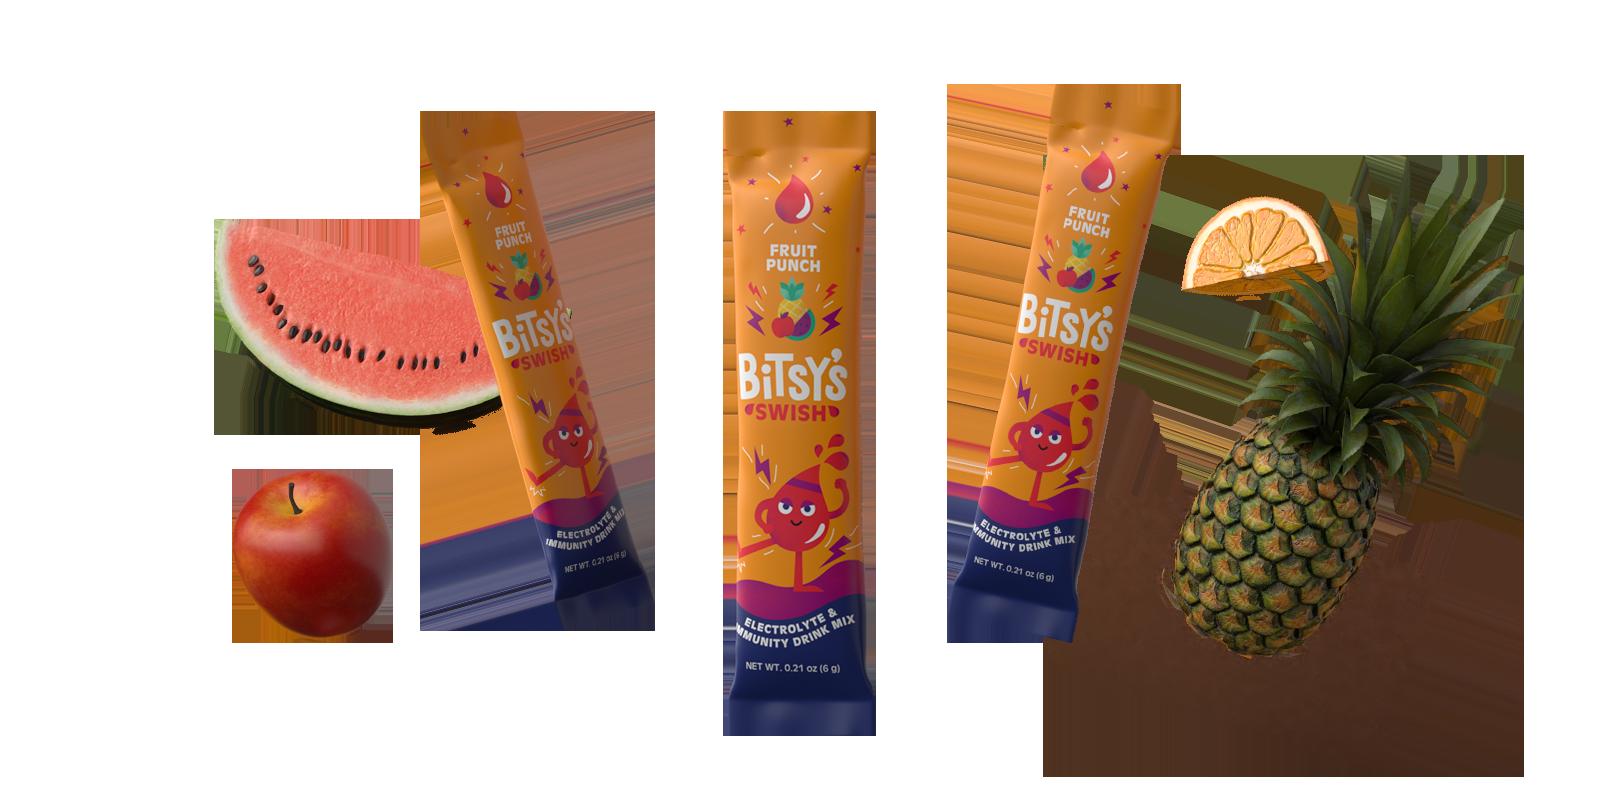 Bitsy's Swish Fruit Punch